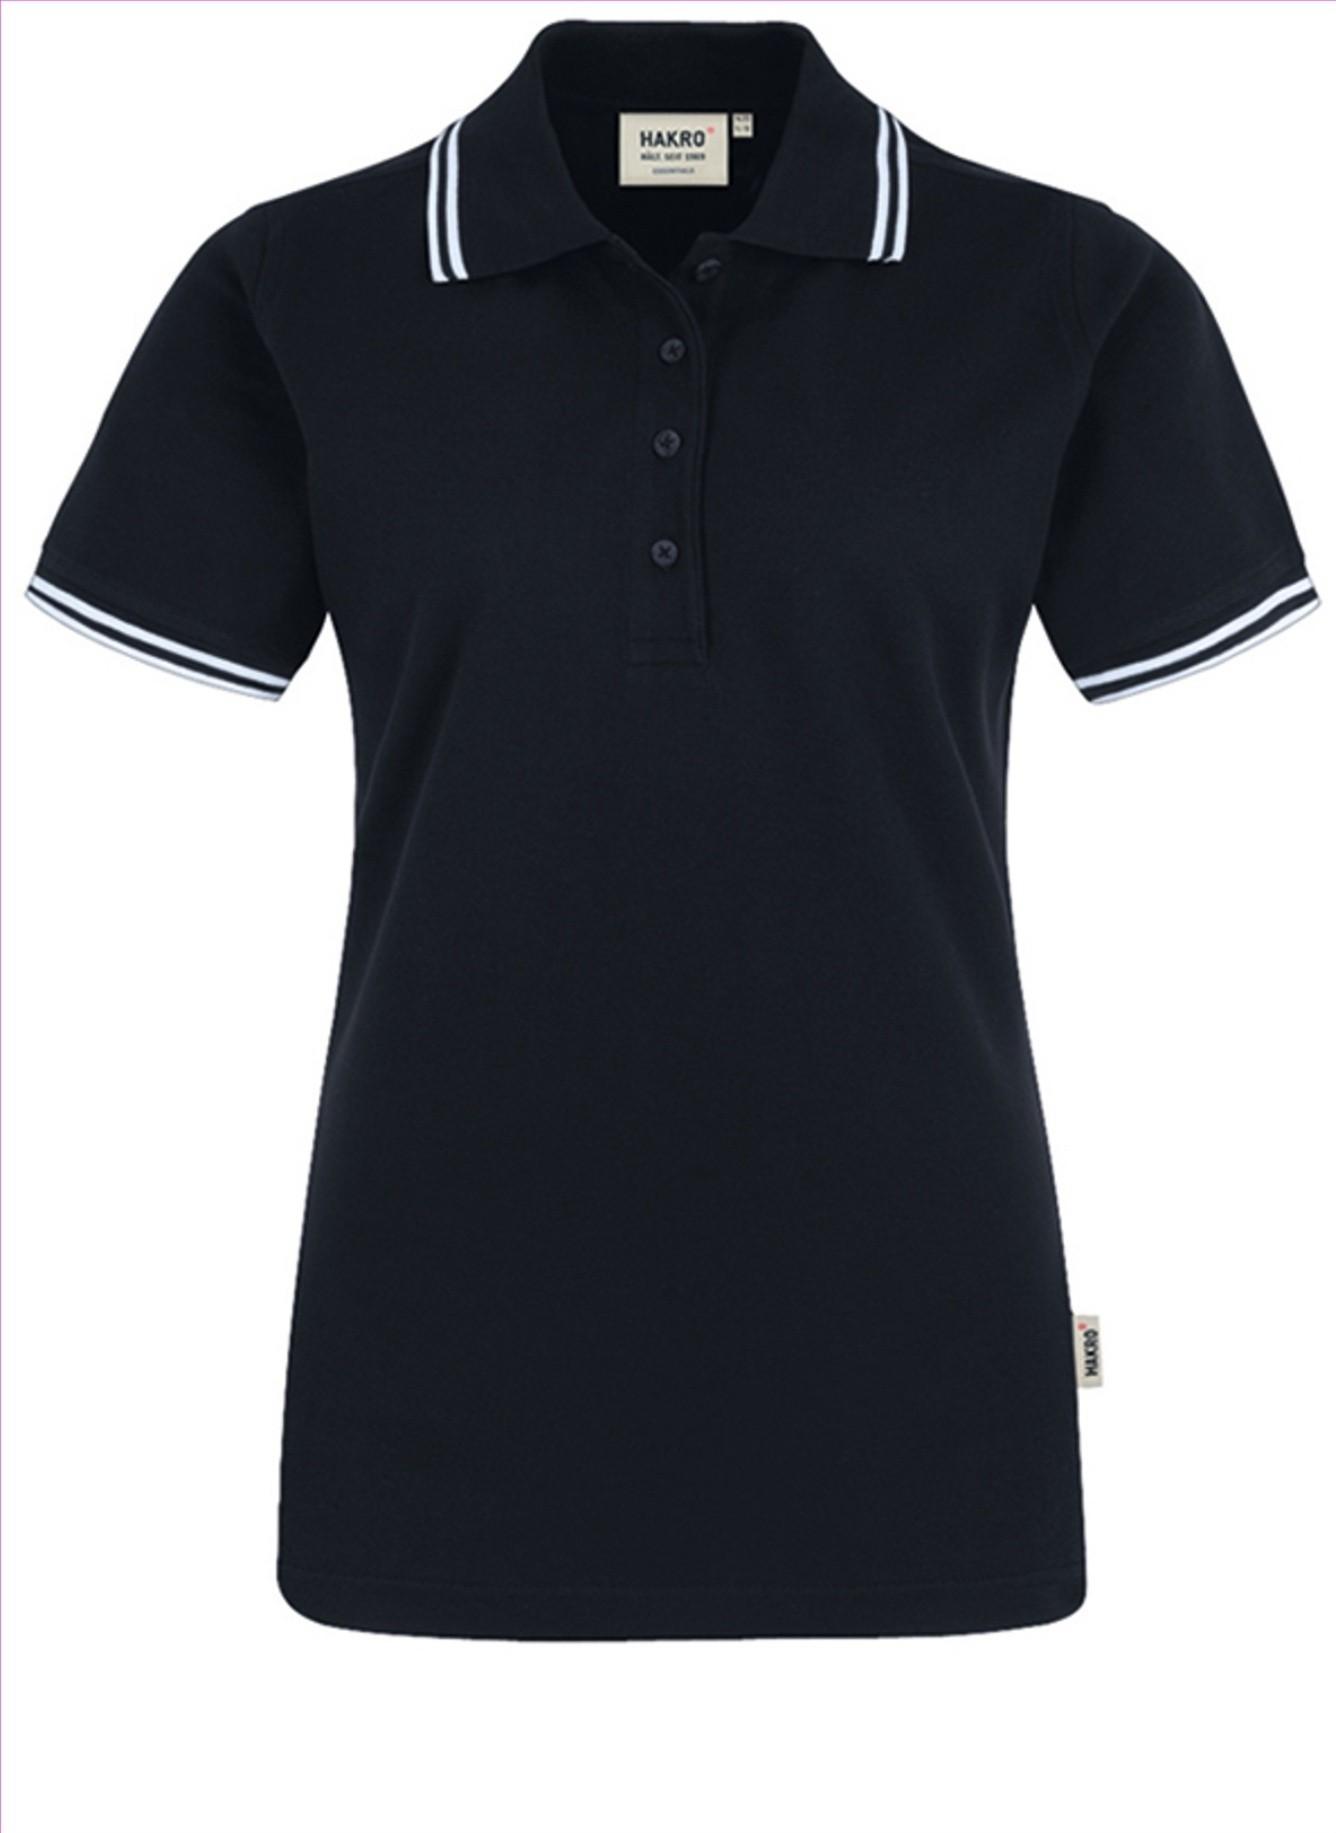 HAKRO Poloshirt Twin-Stripe Damen